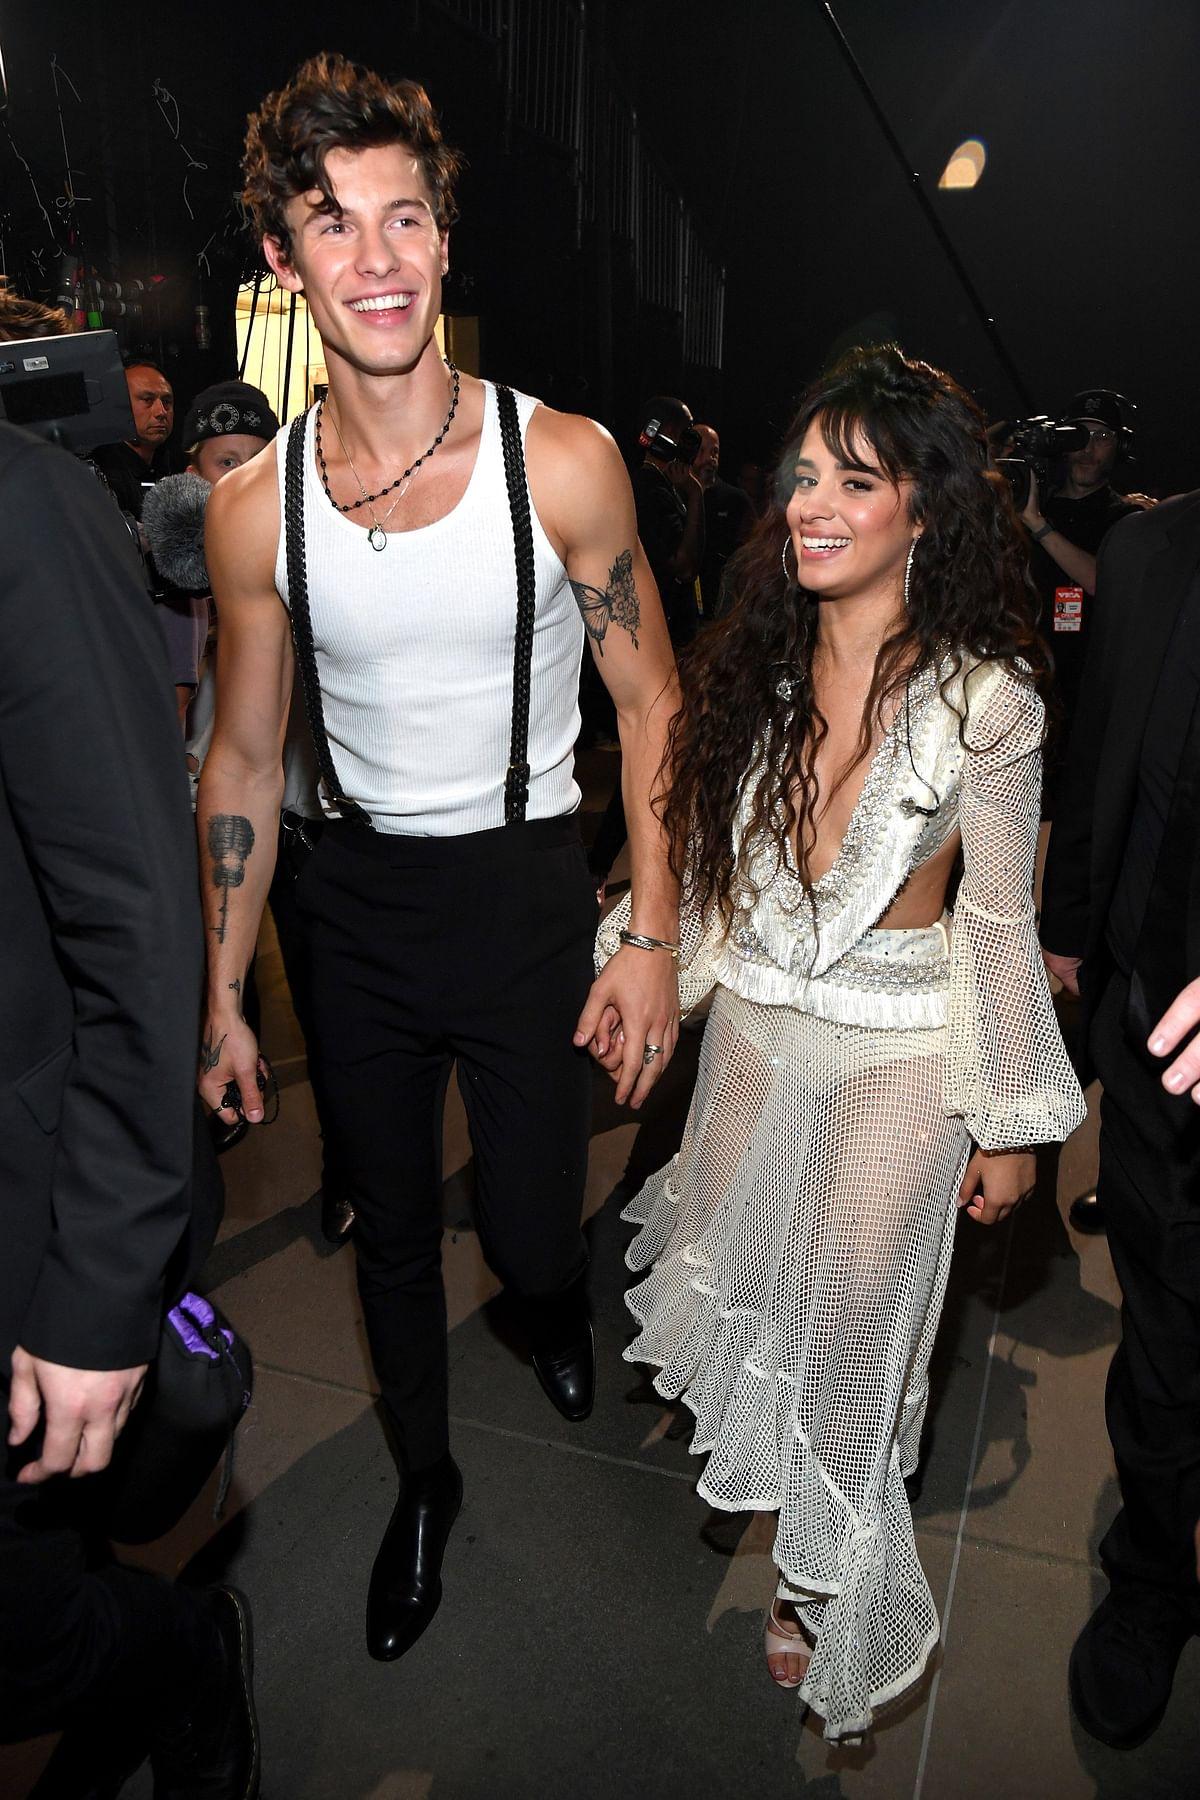 Shawn Mendes & Camila Cabello at the MTV Video Music Awards.